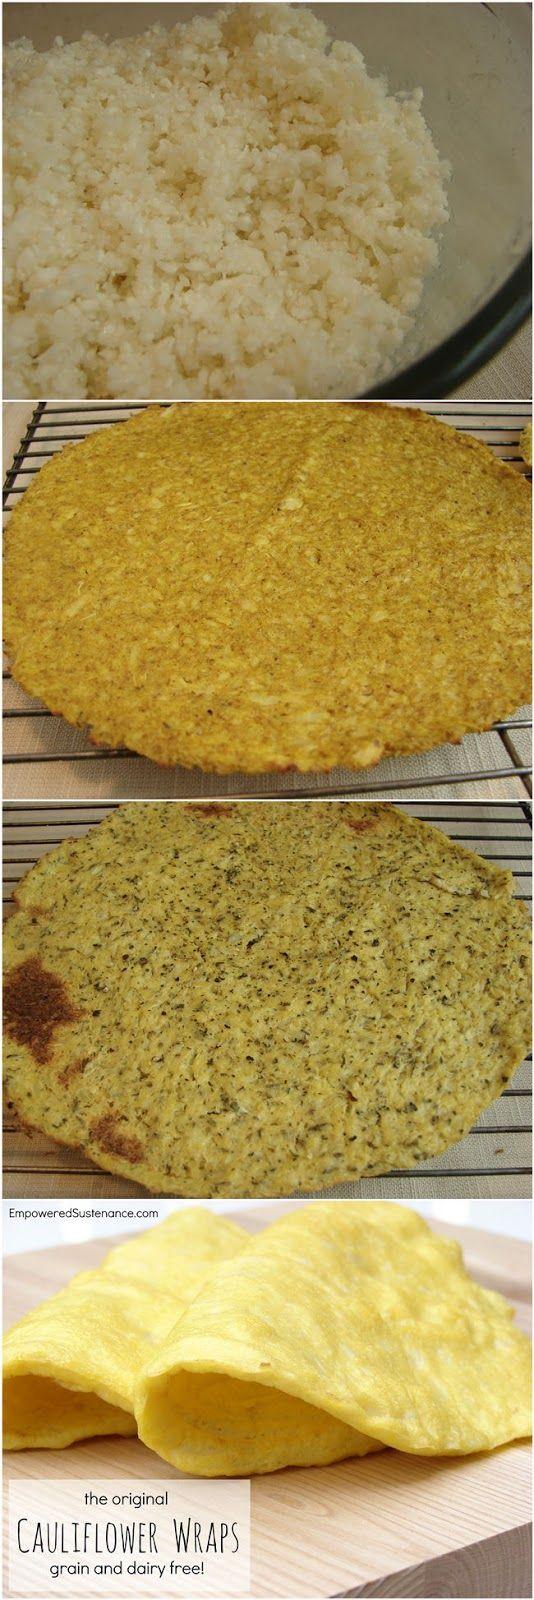 Cauliflower Wraps    Curry Wraps: 1/2 head cauliflower, cut into florets 2 eggs 1/2 tsp. curry powder 1/4 tsp. salt Garlic Herb Wraps: Substitute 1 minced garlic clove and 3/4 tsp. dried herbs (basil, oregano, thyme or a combo) for the curry powder